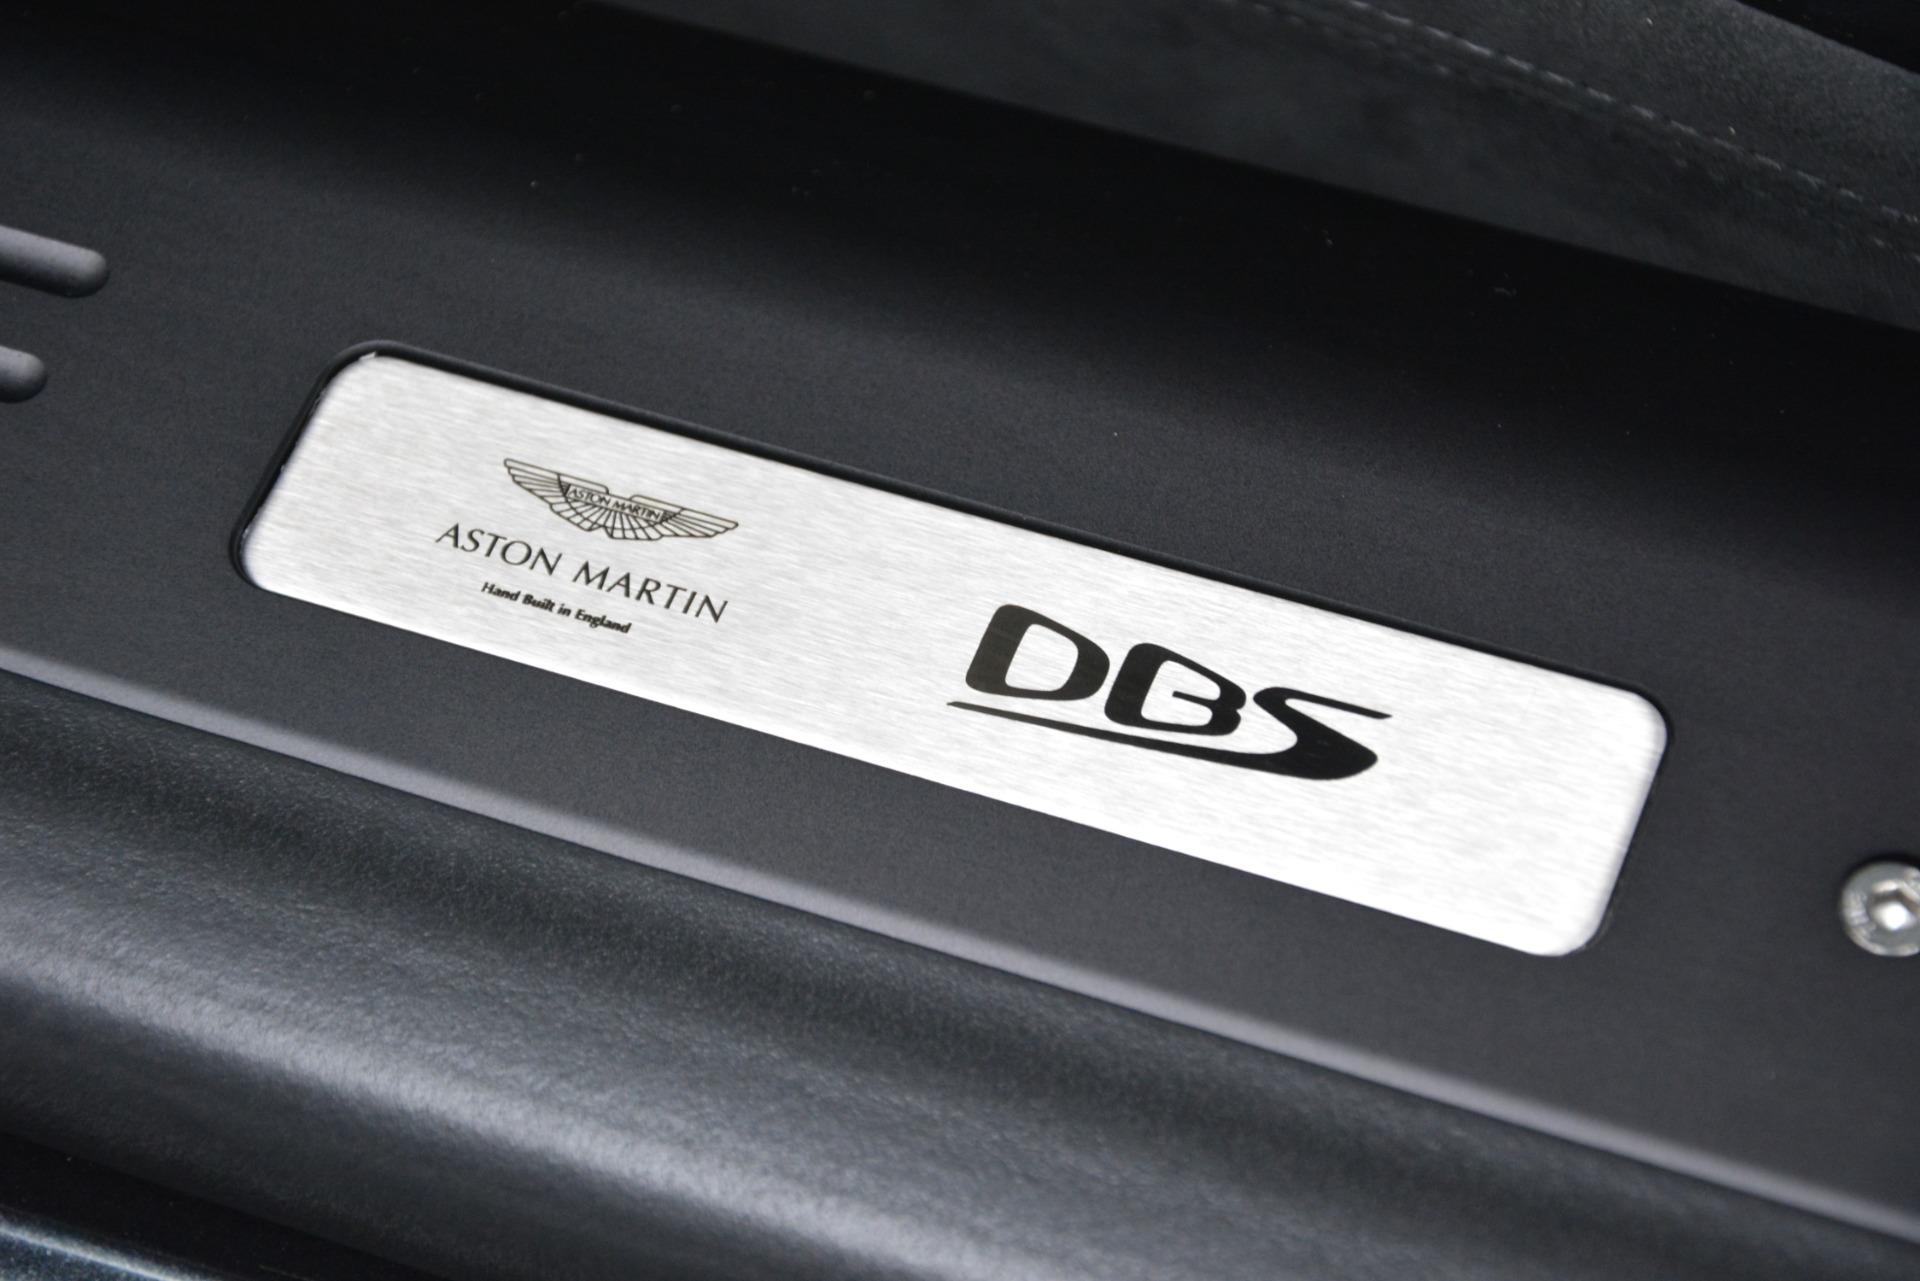 New 2019 Aston Martin DBS Superleggera Coupe For Sale In Greenwich, CT 3318_p20